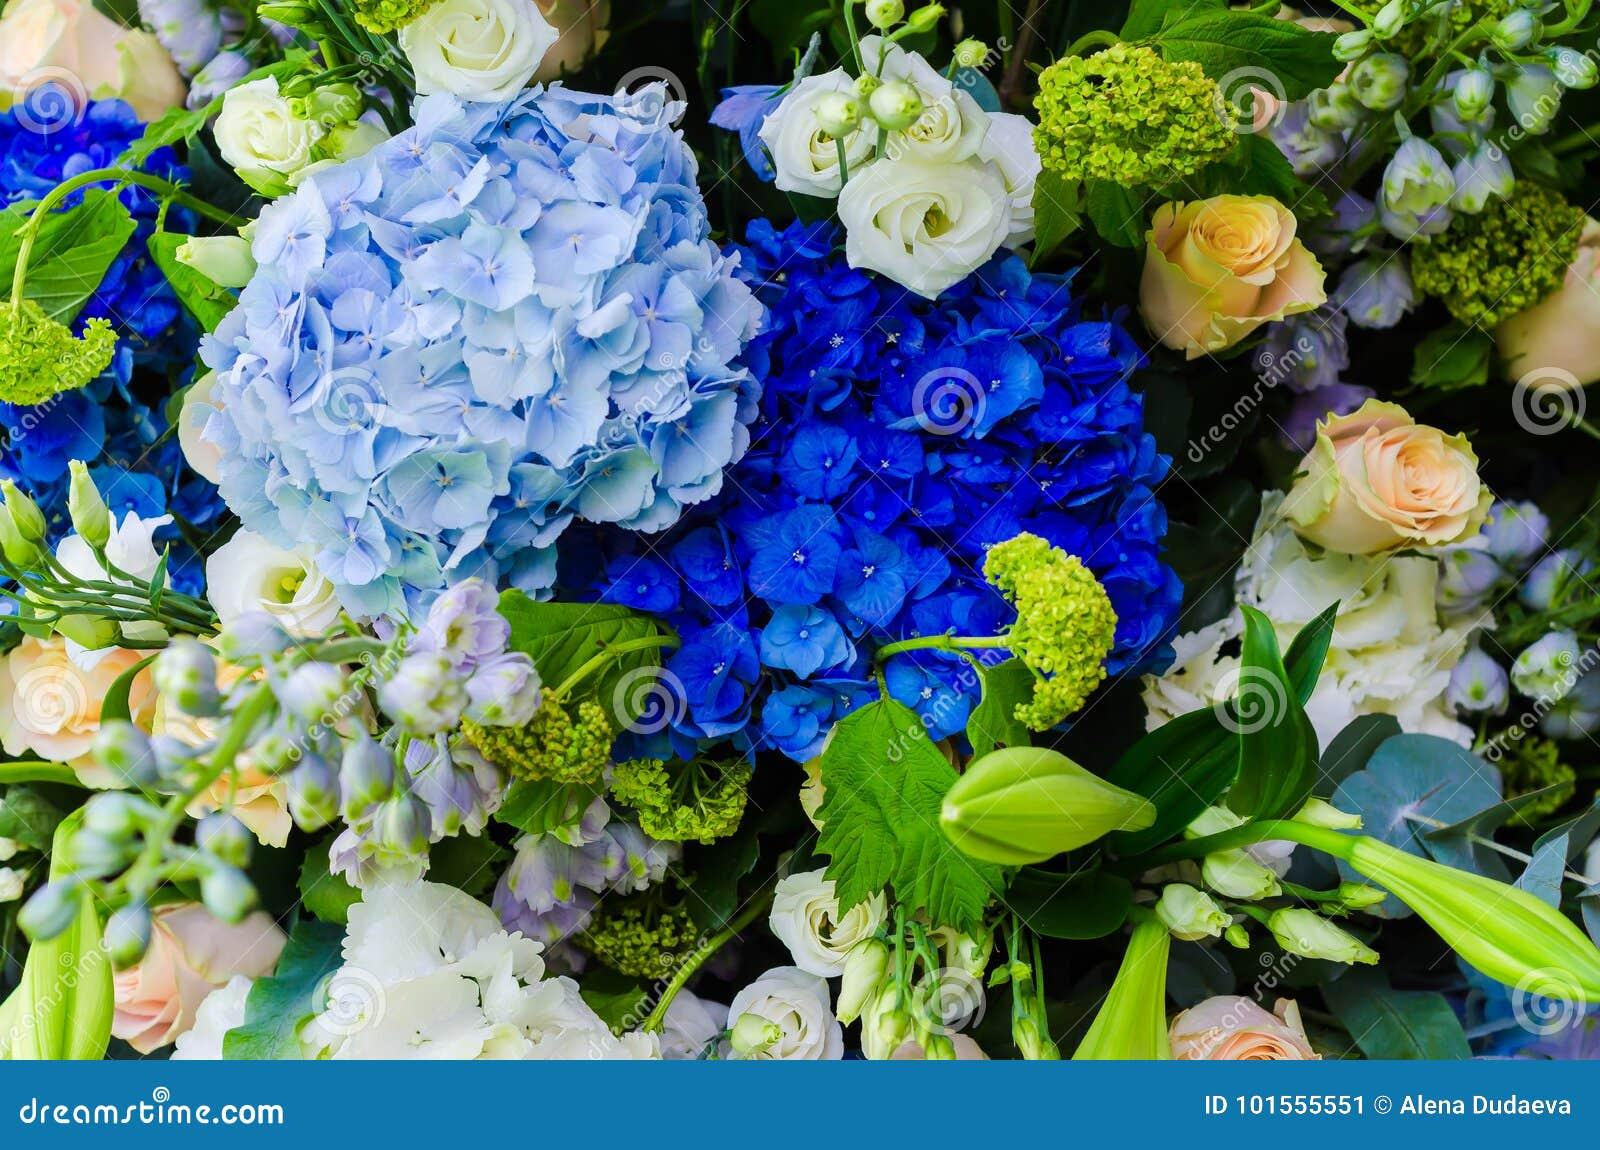 Bright Blue Hydrangea In A Beautiful Flower Arrangement Stock Image